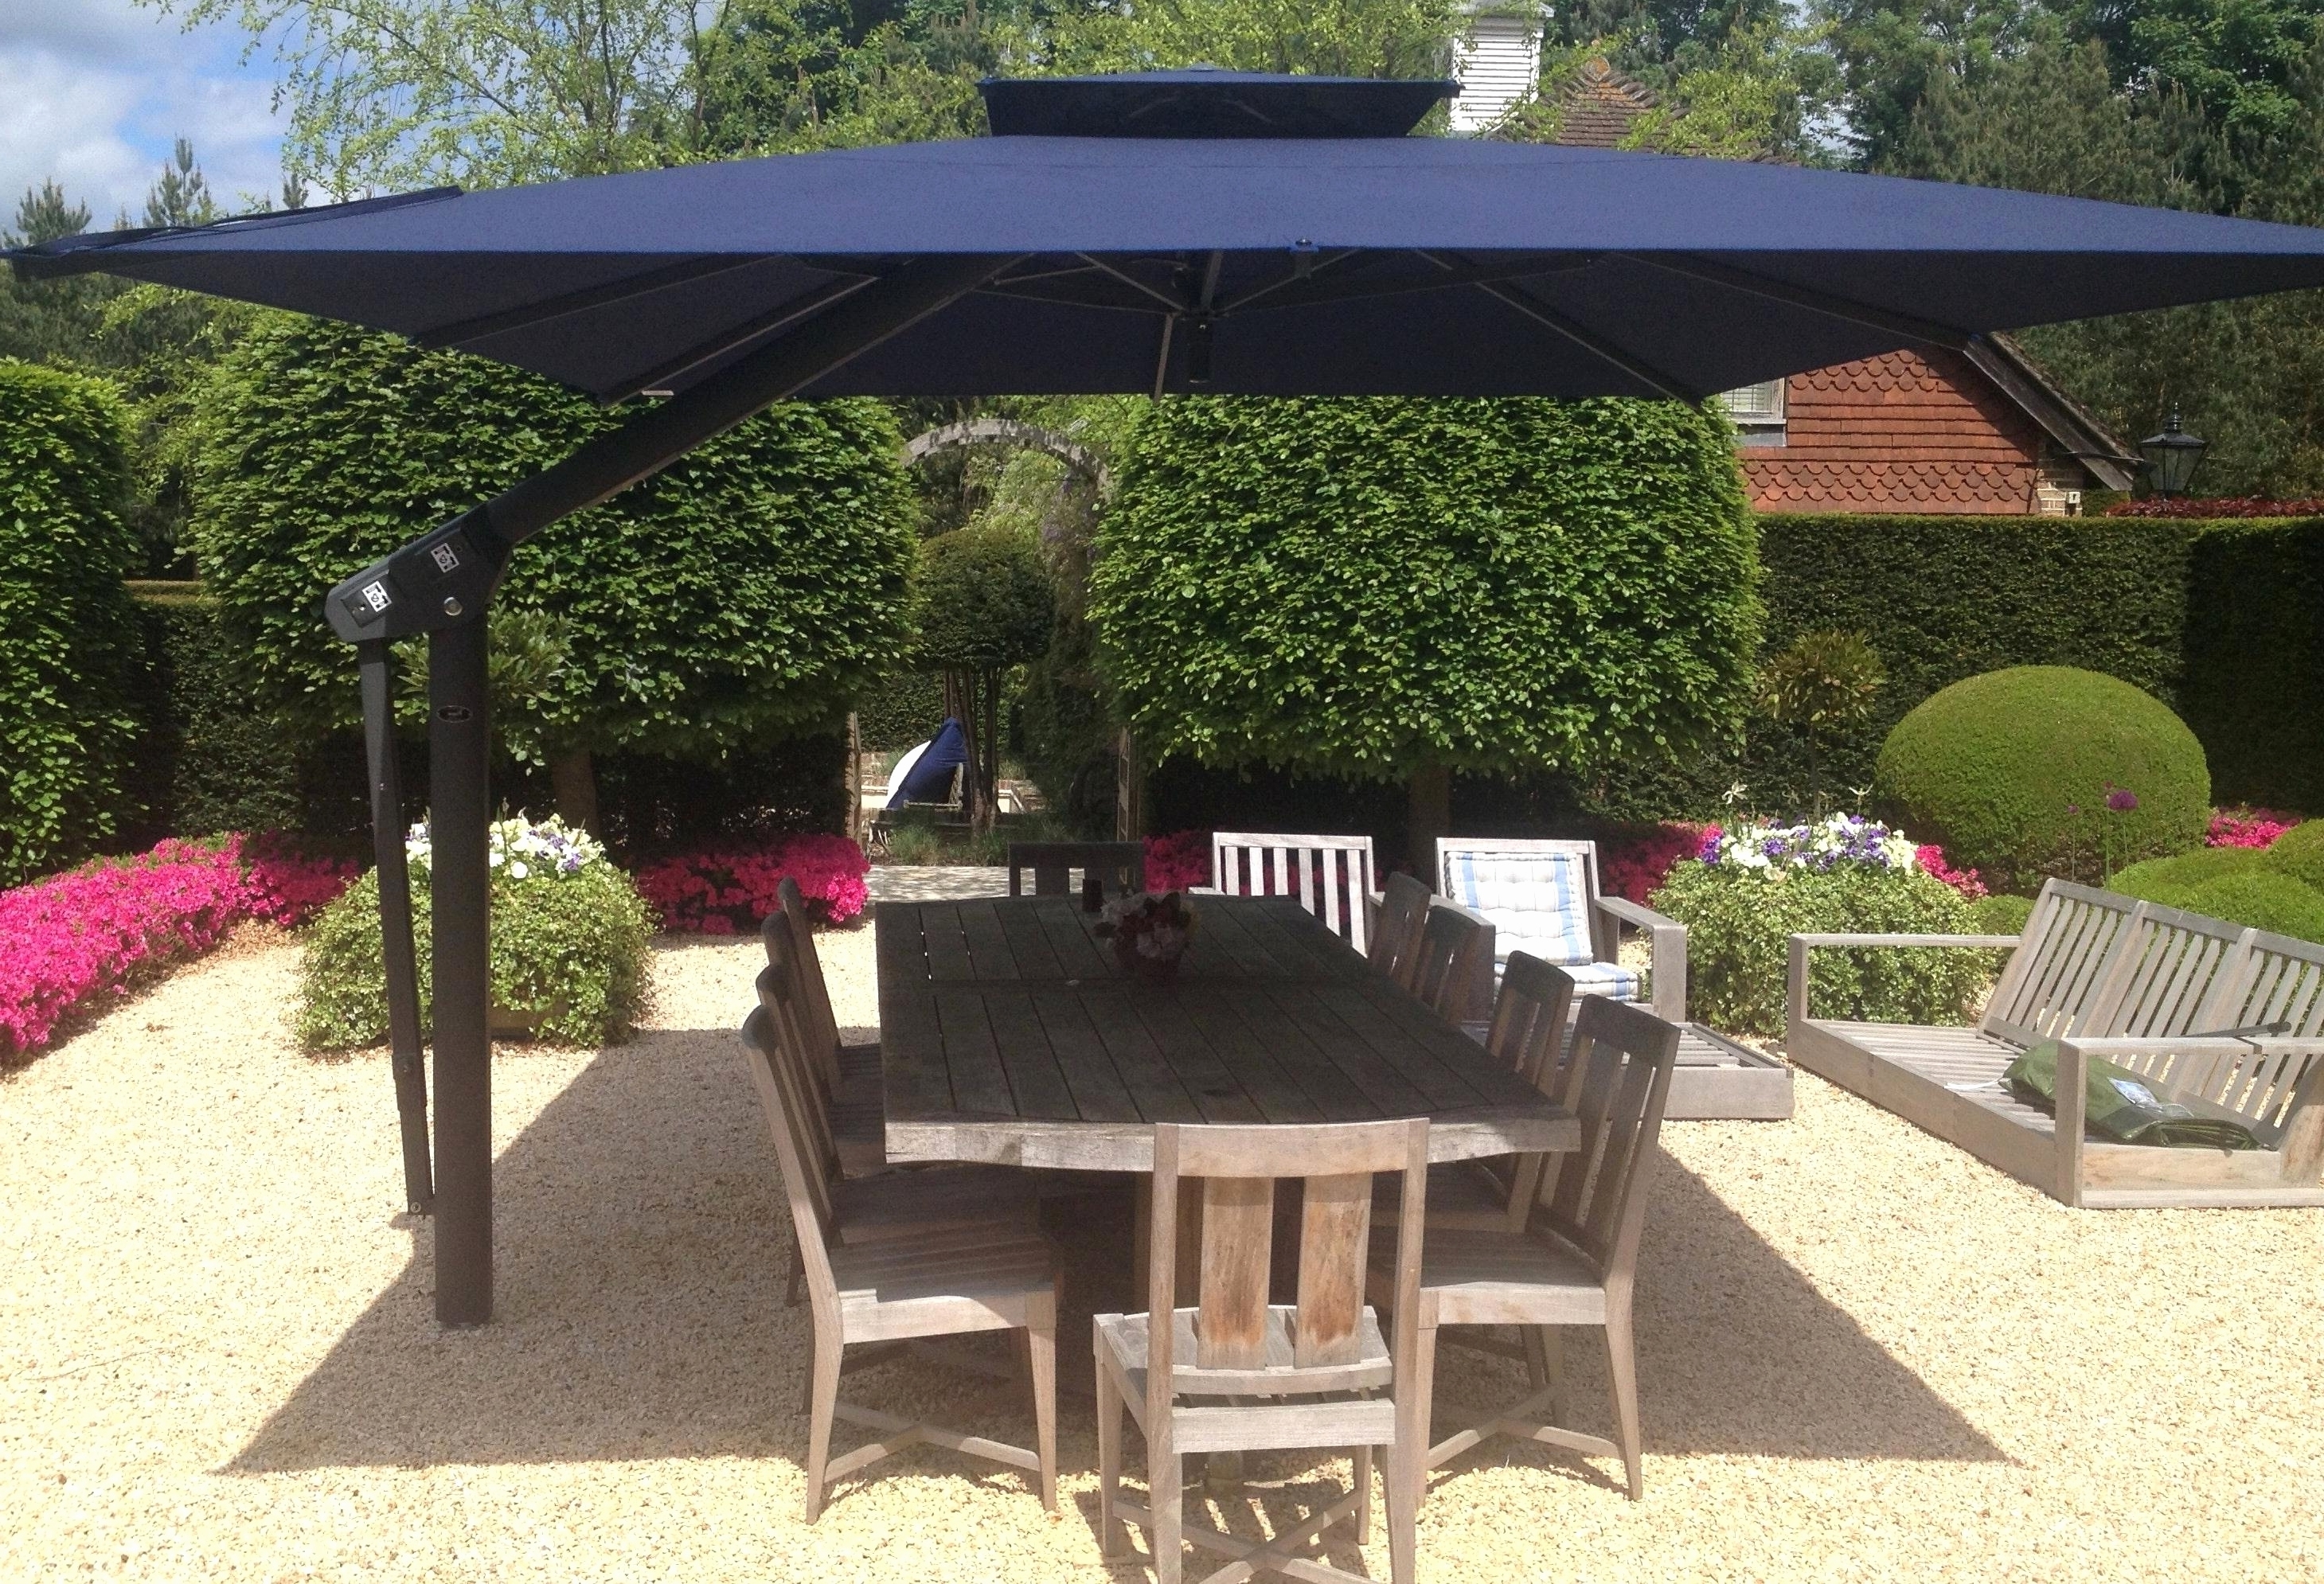 Most Recent Small Patio Umbrella Part 2 Outdoor Umbrellas – Theestatesga In Small Patio Tables With Umbrellas Hole (View 7 of 20)